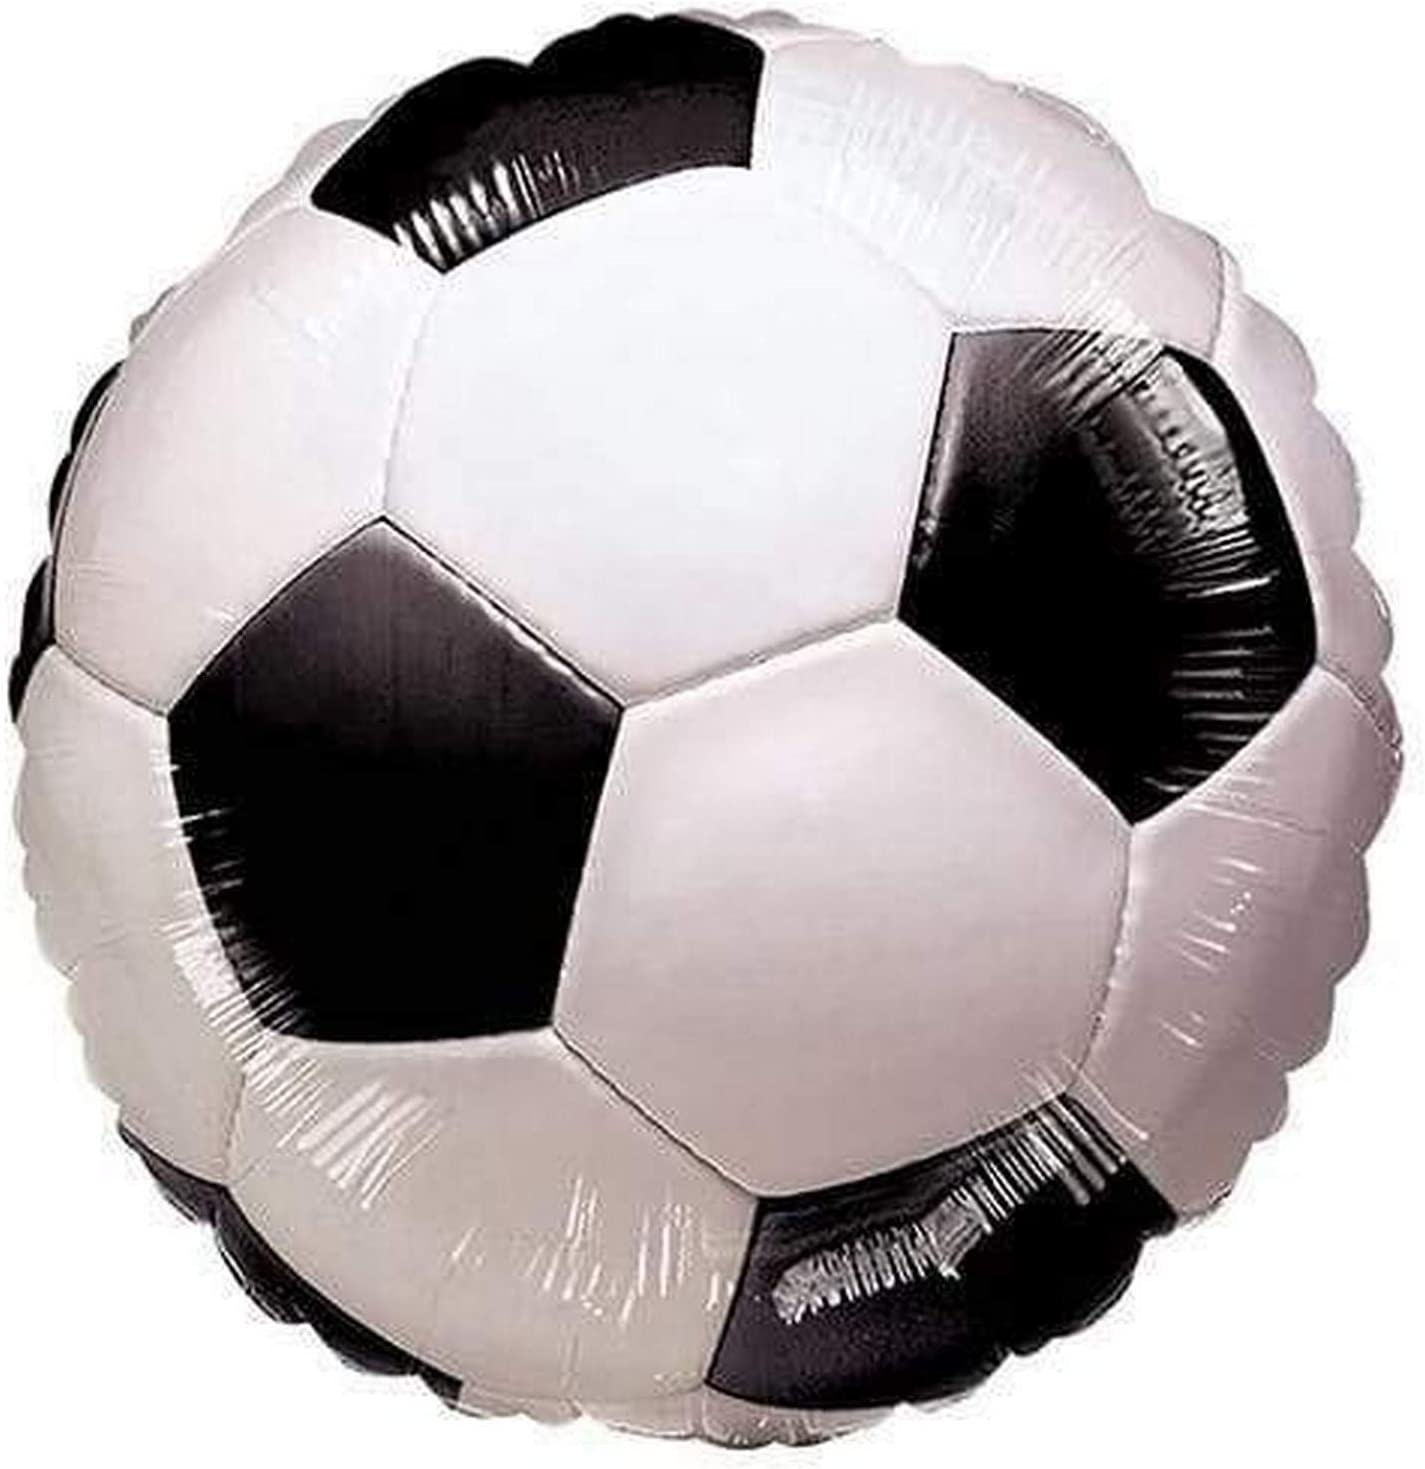 Multicolored 18 Anagram 0 Championship Soccer Foil Balloon